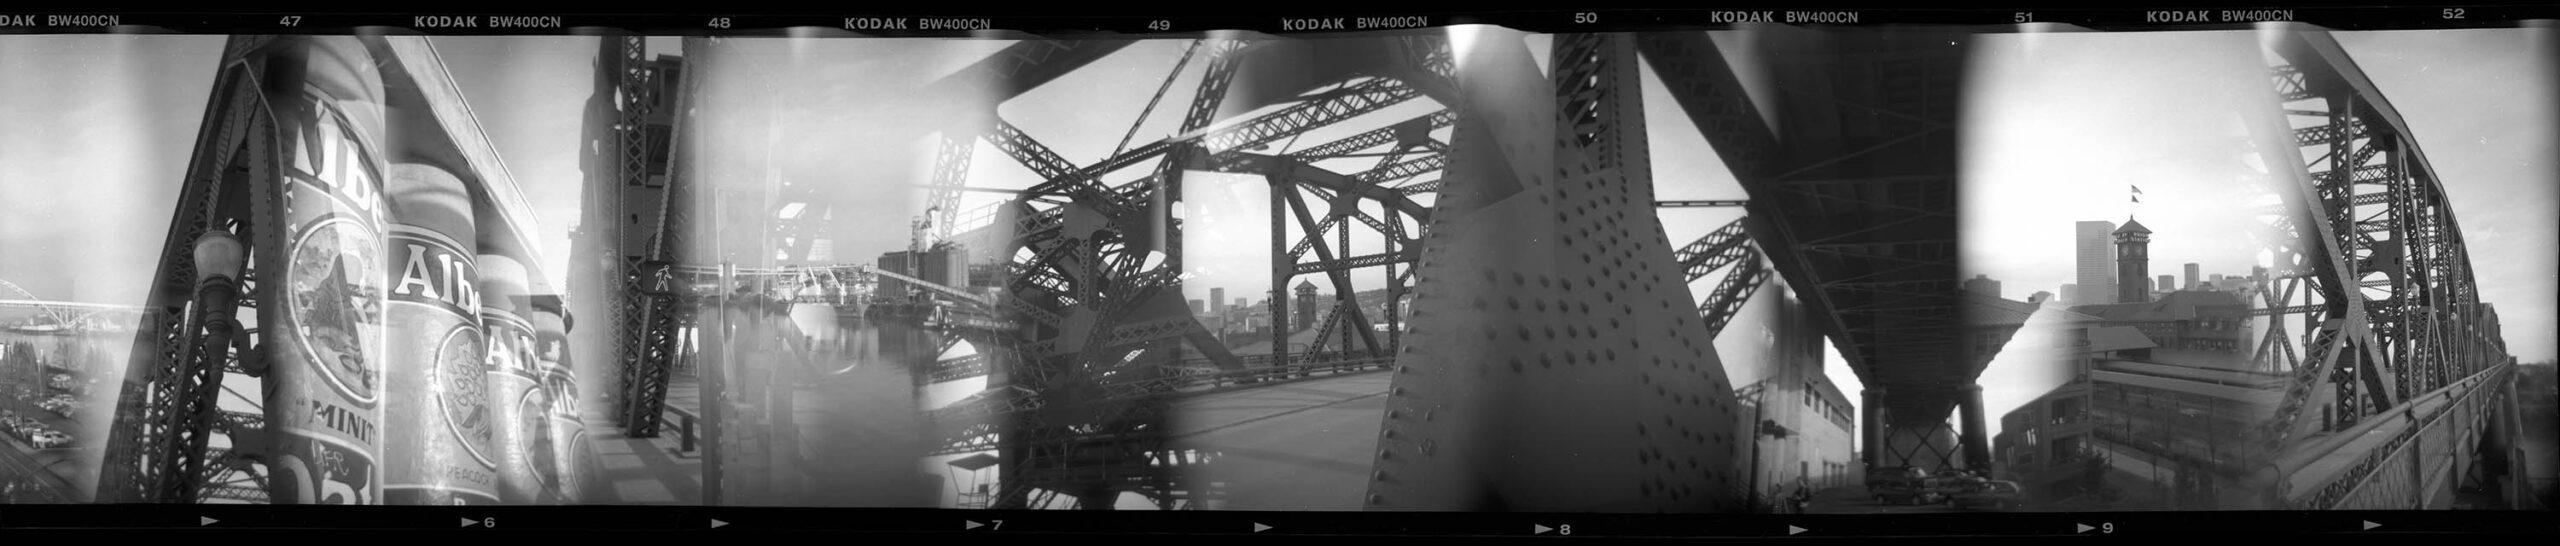 Holga multi exposure composite broadway bridge portland